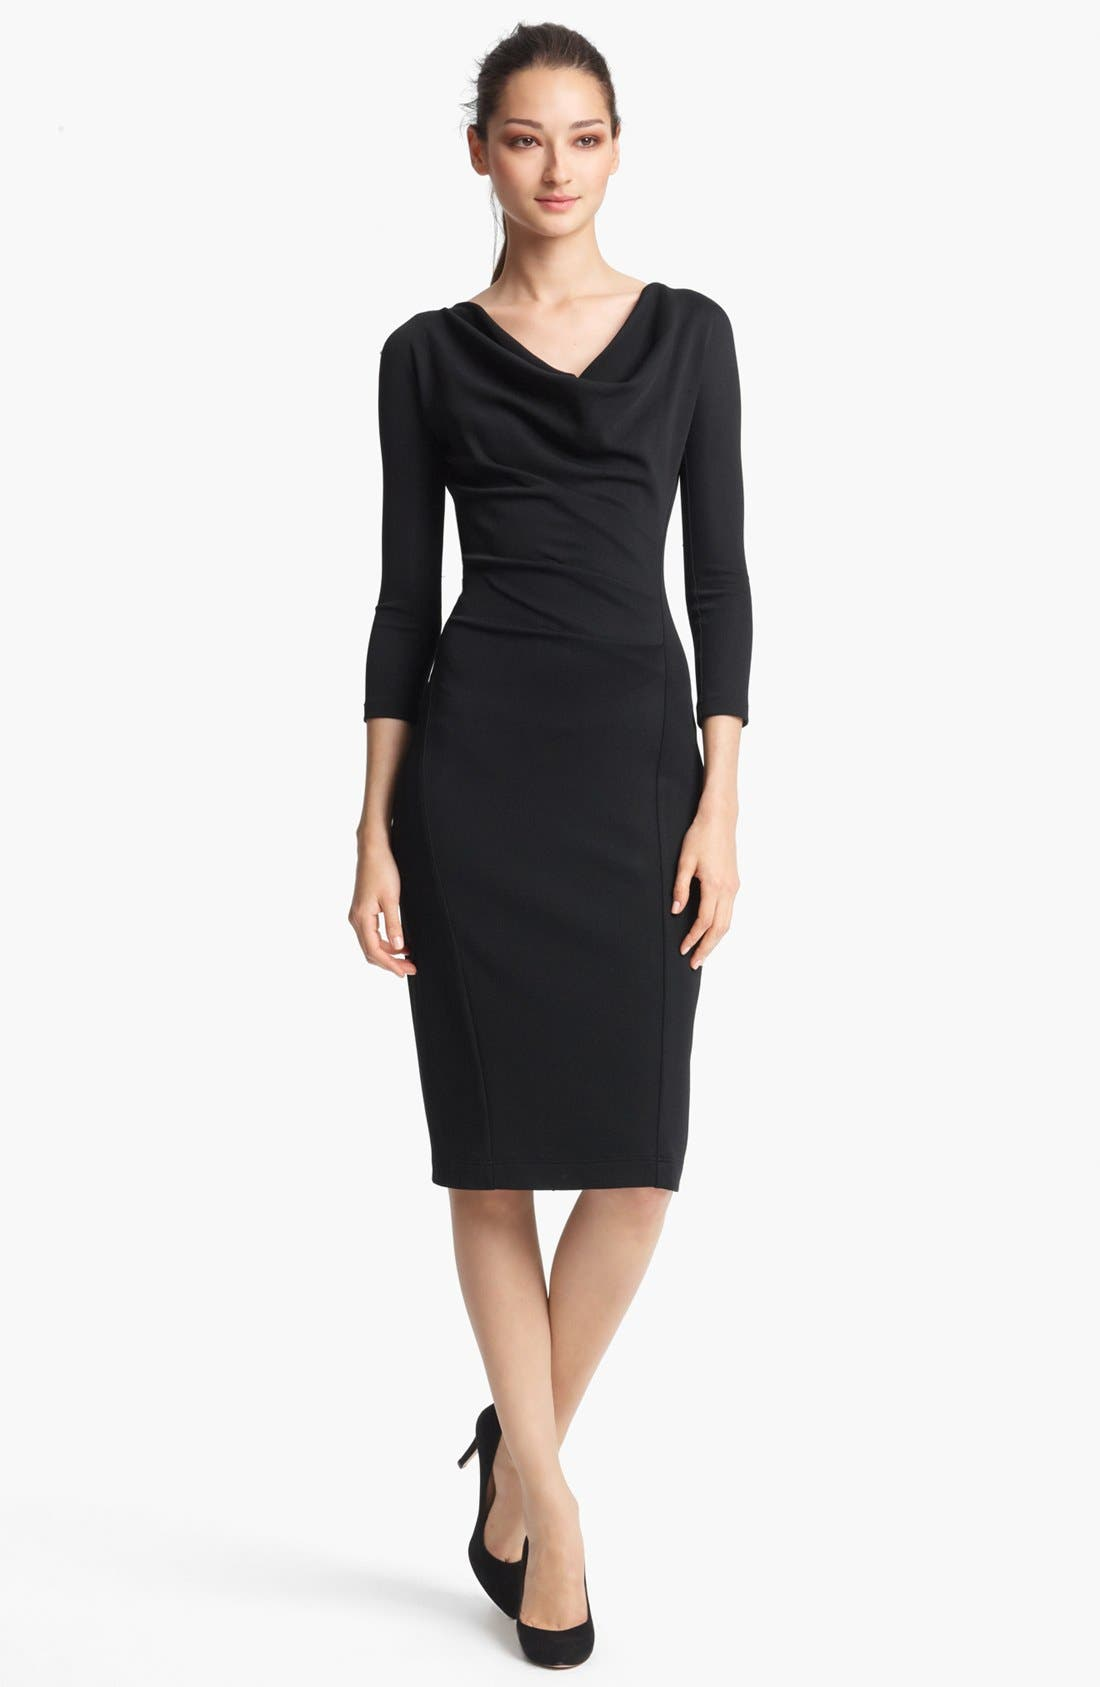 Alternate Image 1 Selected - Donna Karan Collection Crepe Jersey Dress